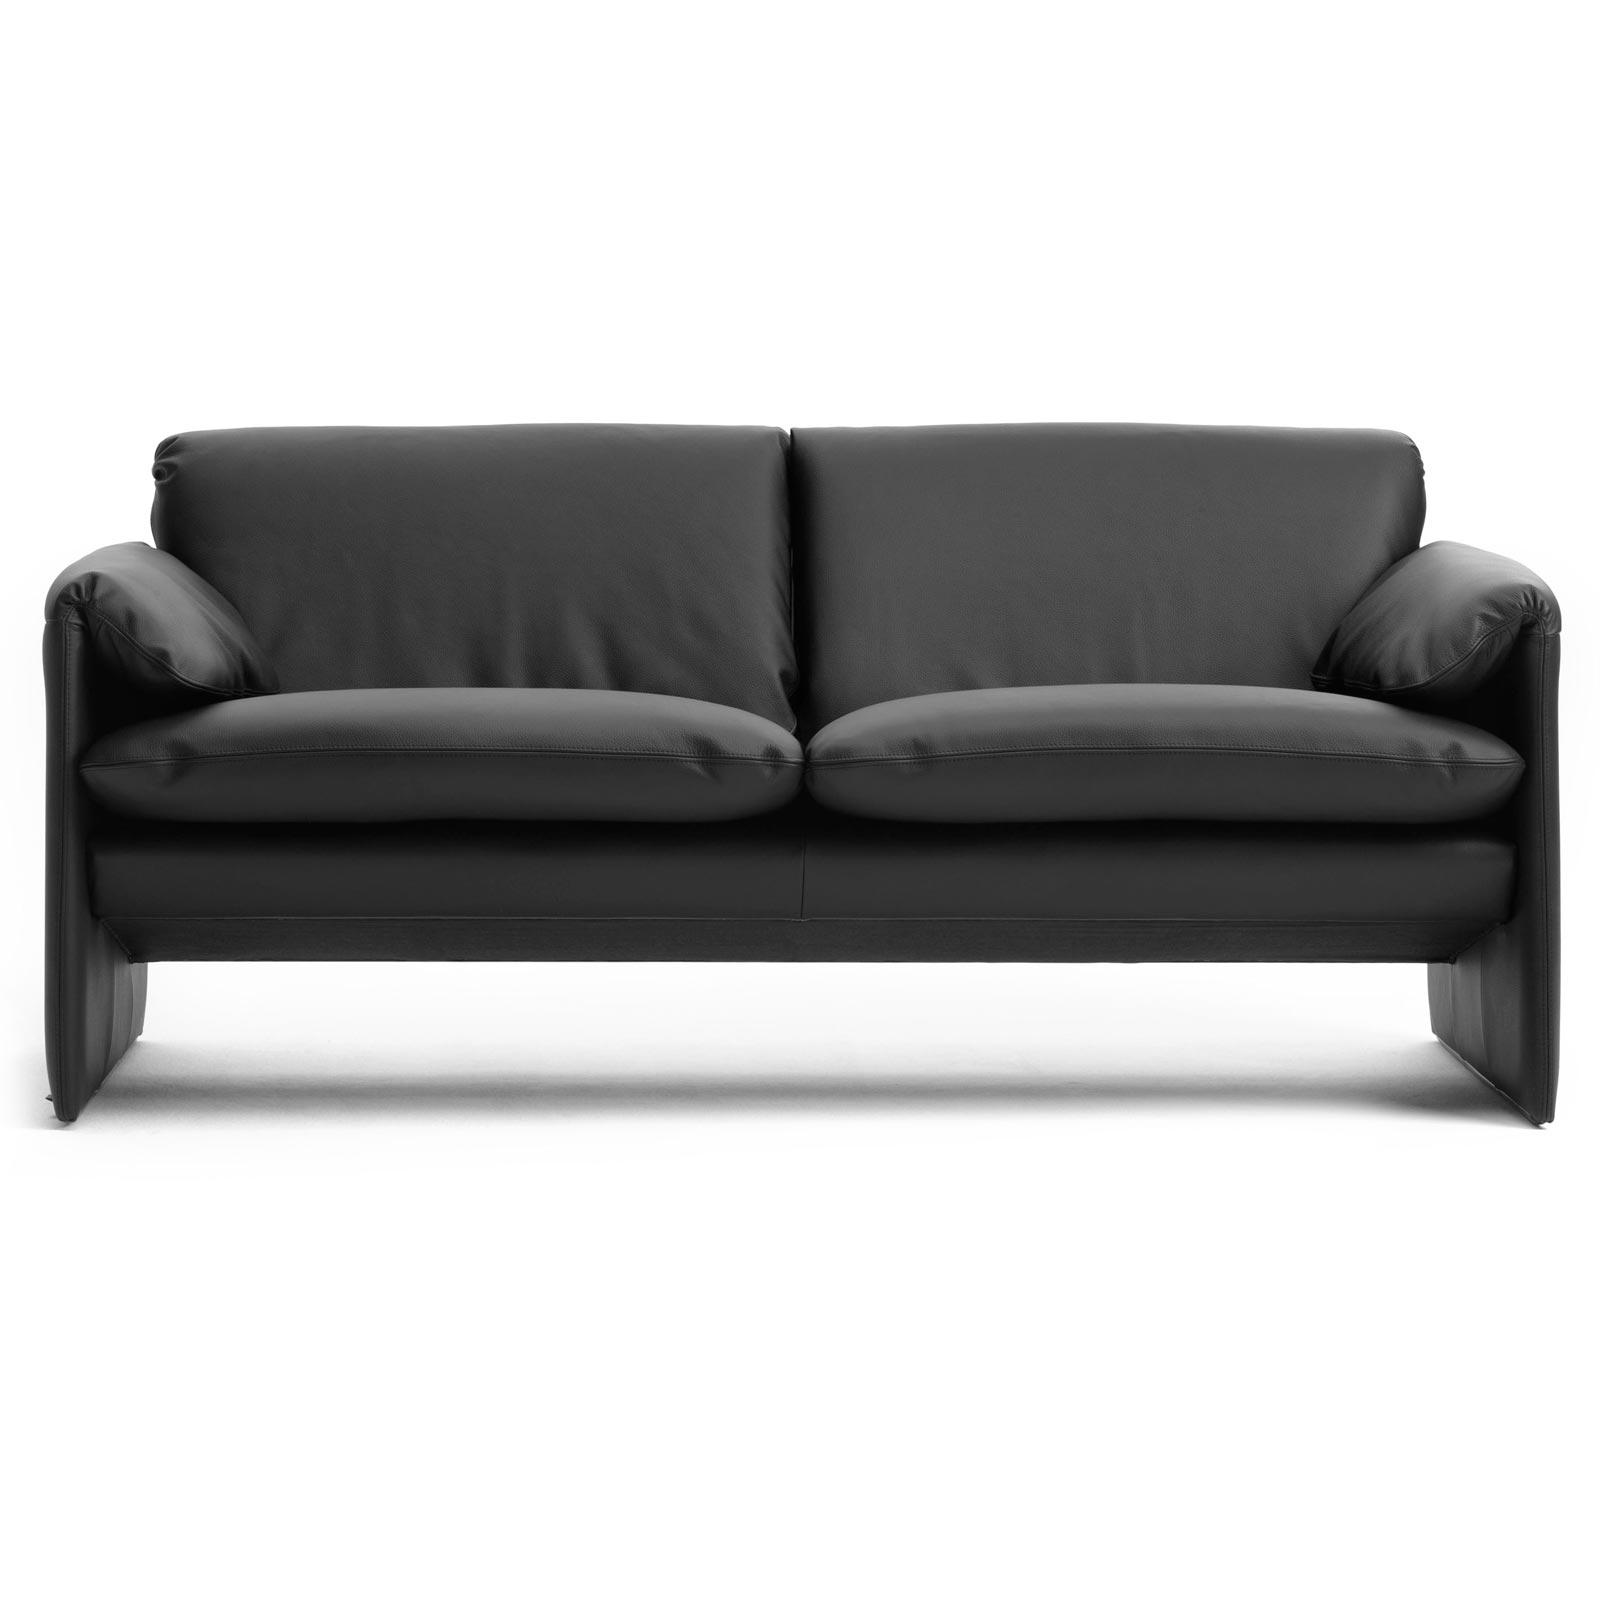 leolux liliom awesome leolux liliom with leolux liliom. Black Bedroom Furniture Sets. Home Design Ideas